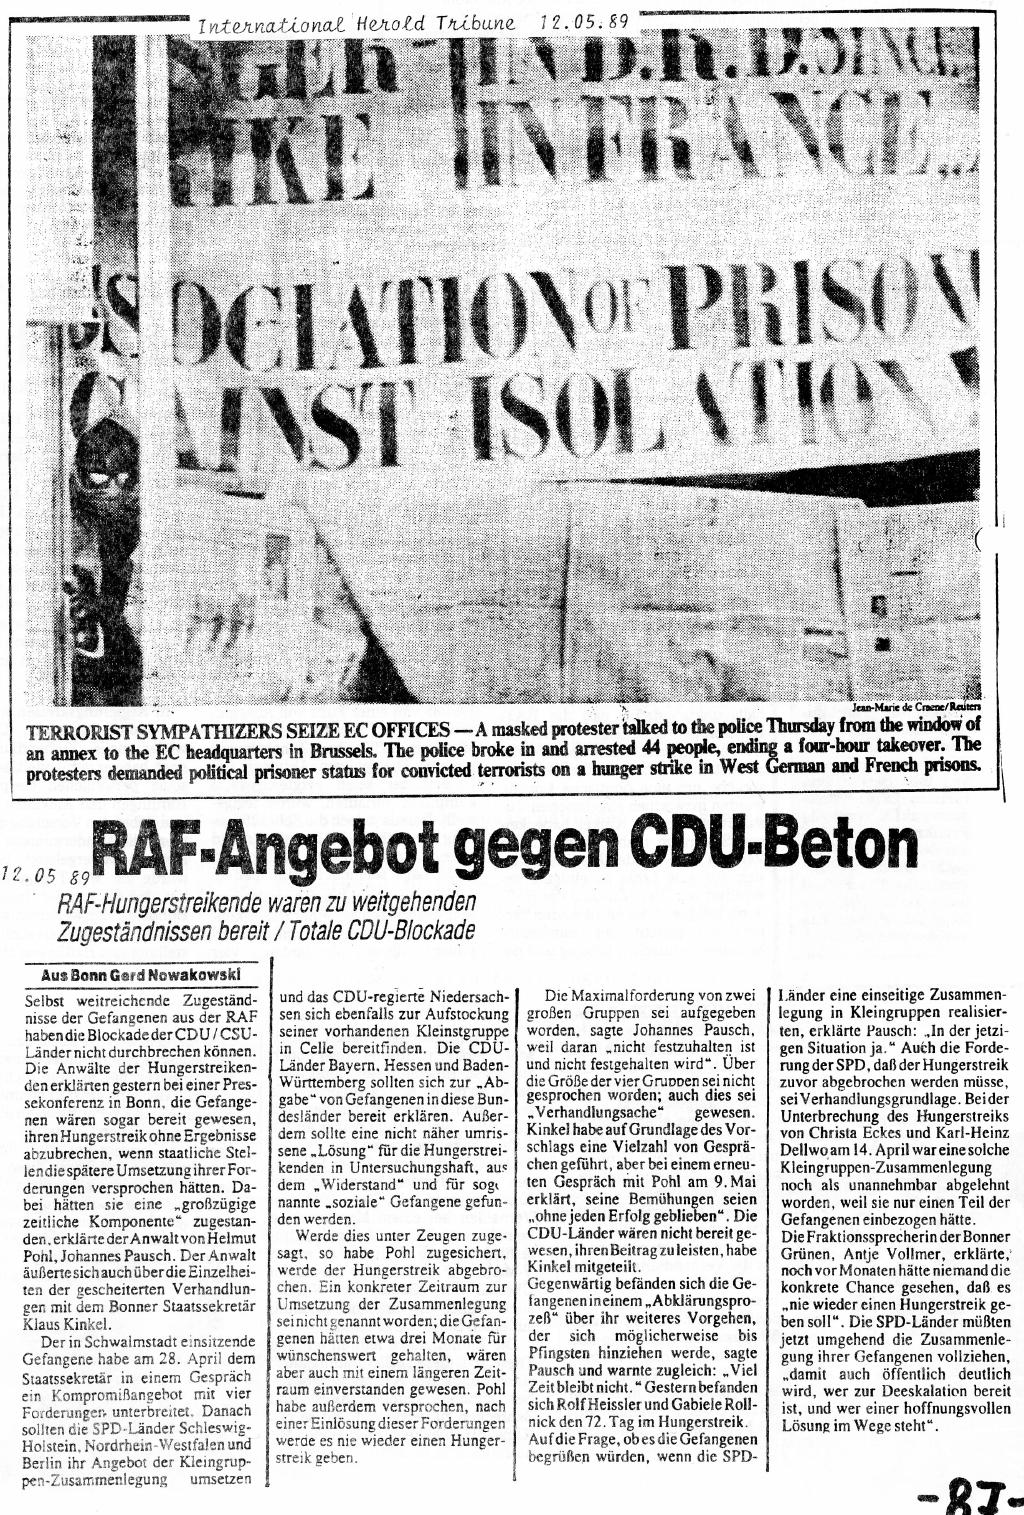 Belgien_Doku_Besetzung_EG_Kommission_1989_089